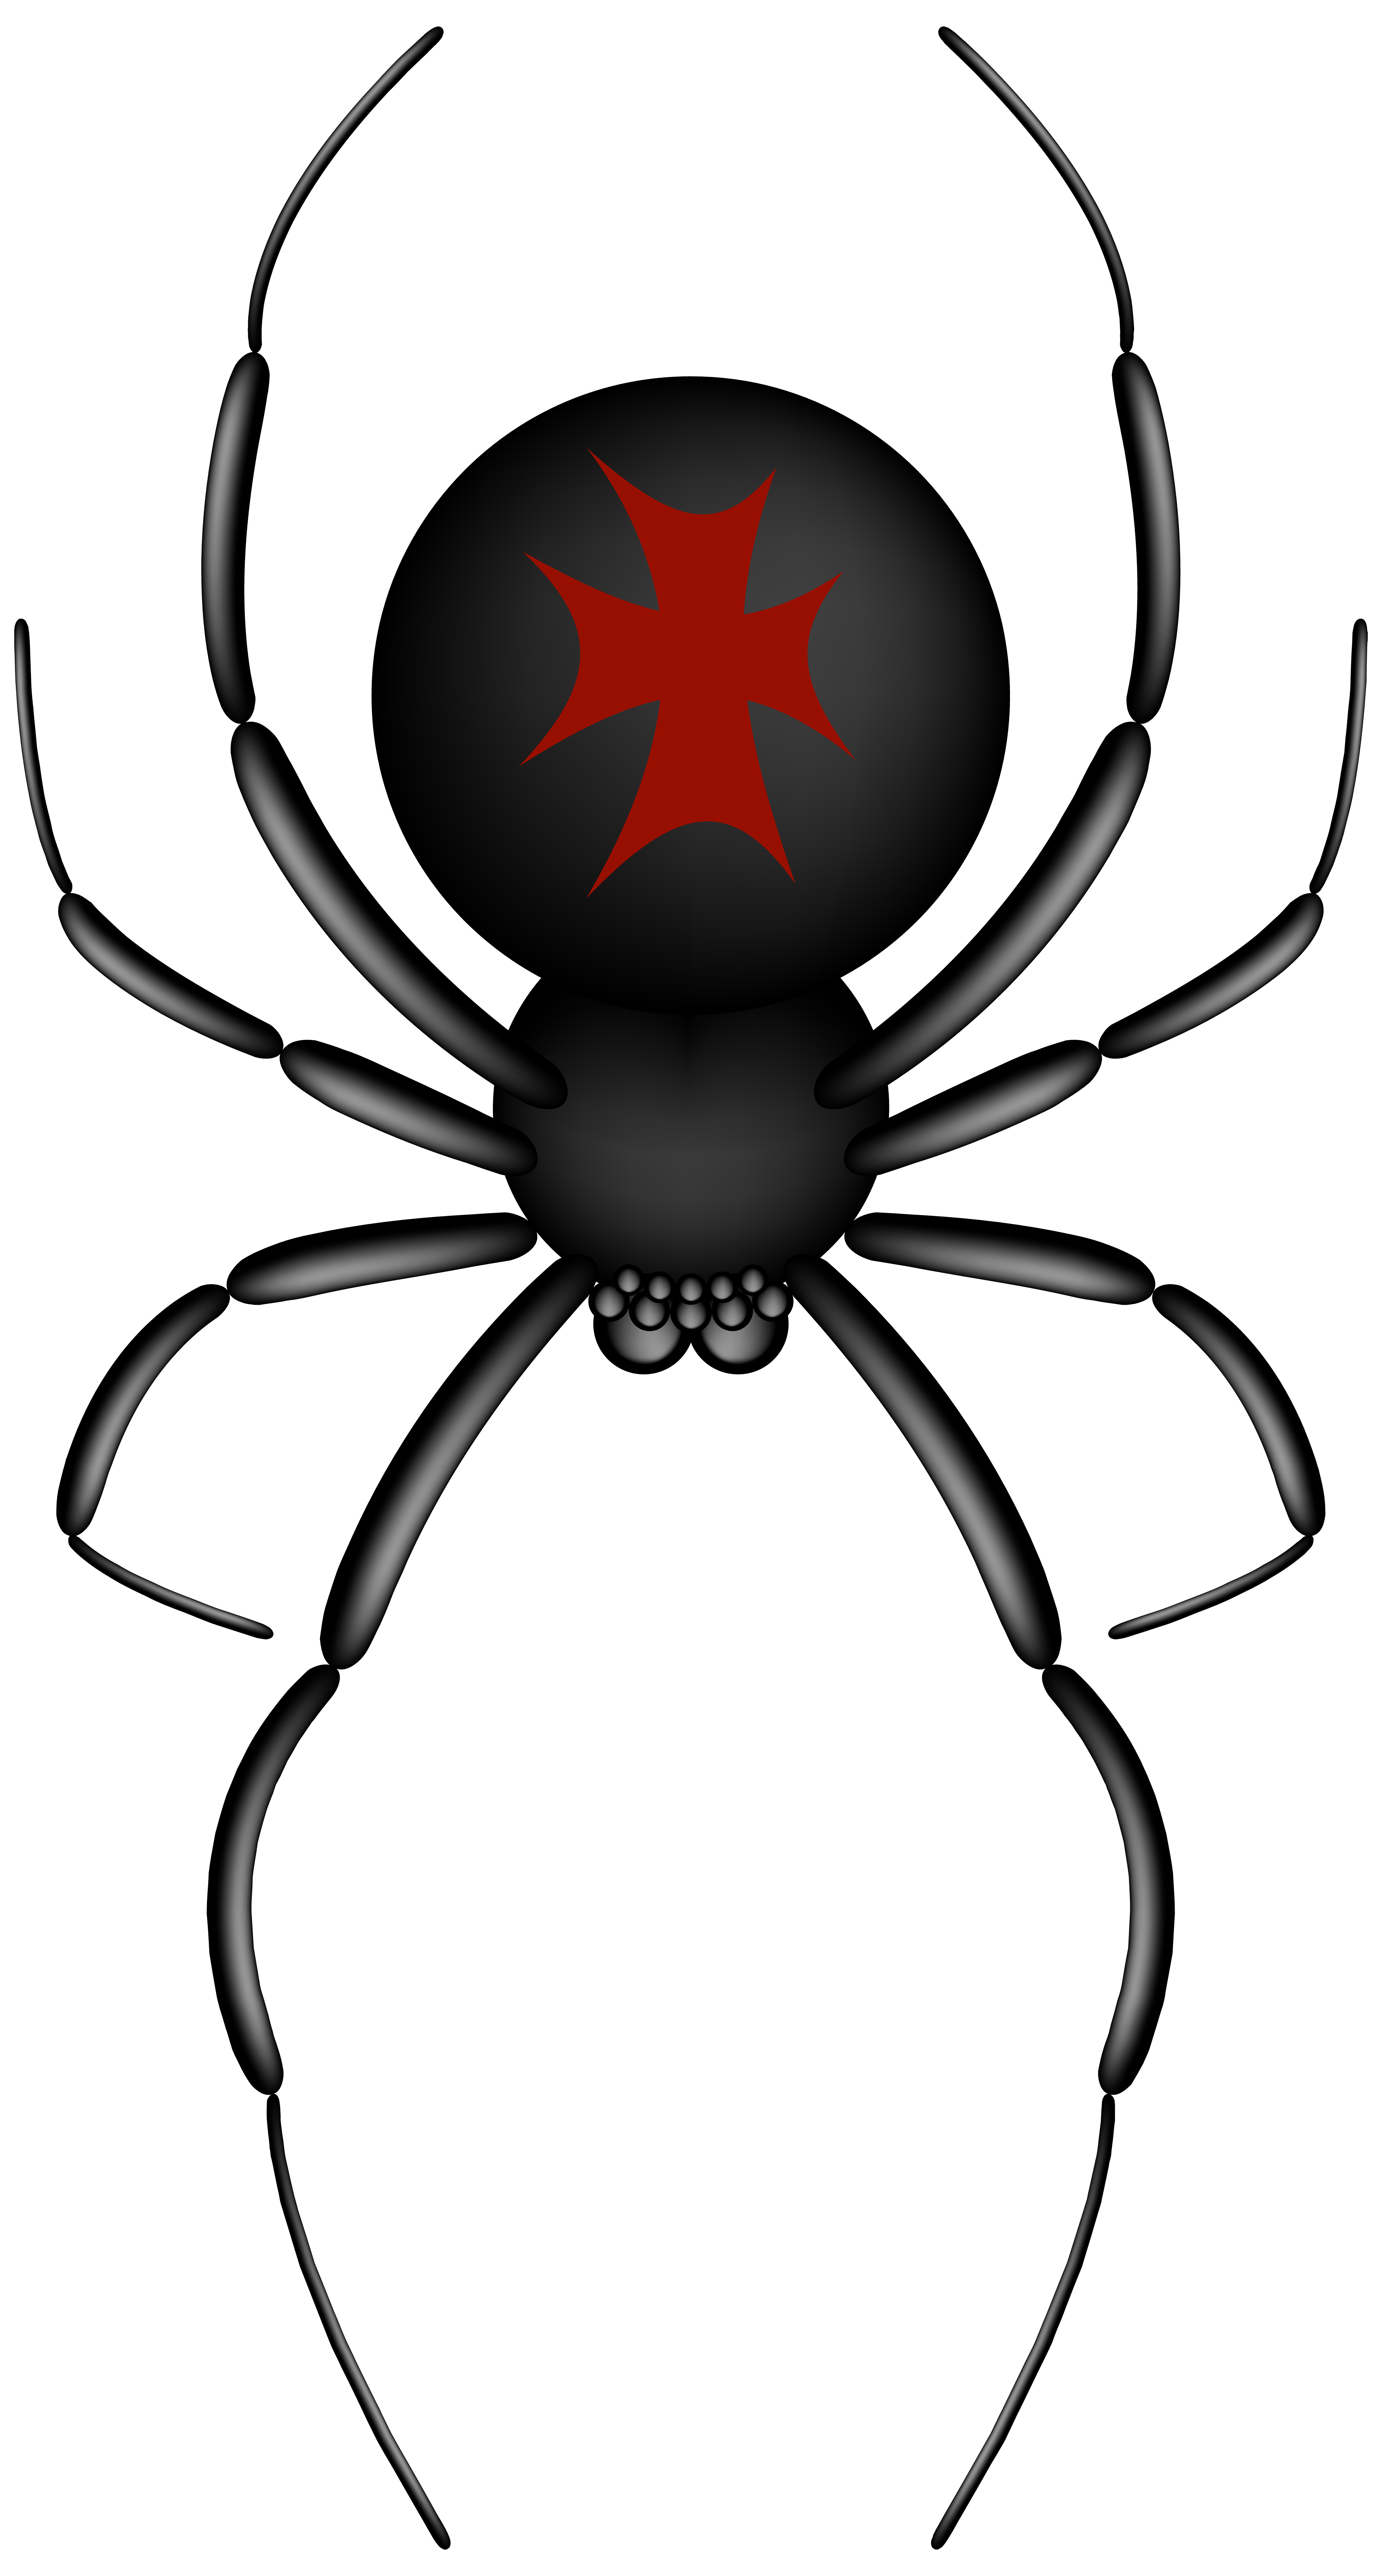 4292x8000 Crusader Spider Transparent Png Clip Art Imageu200b Gallery